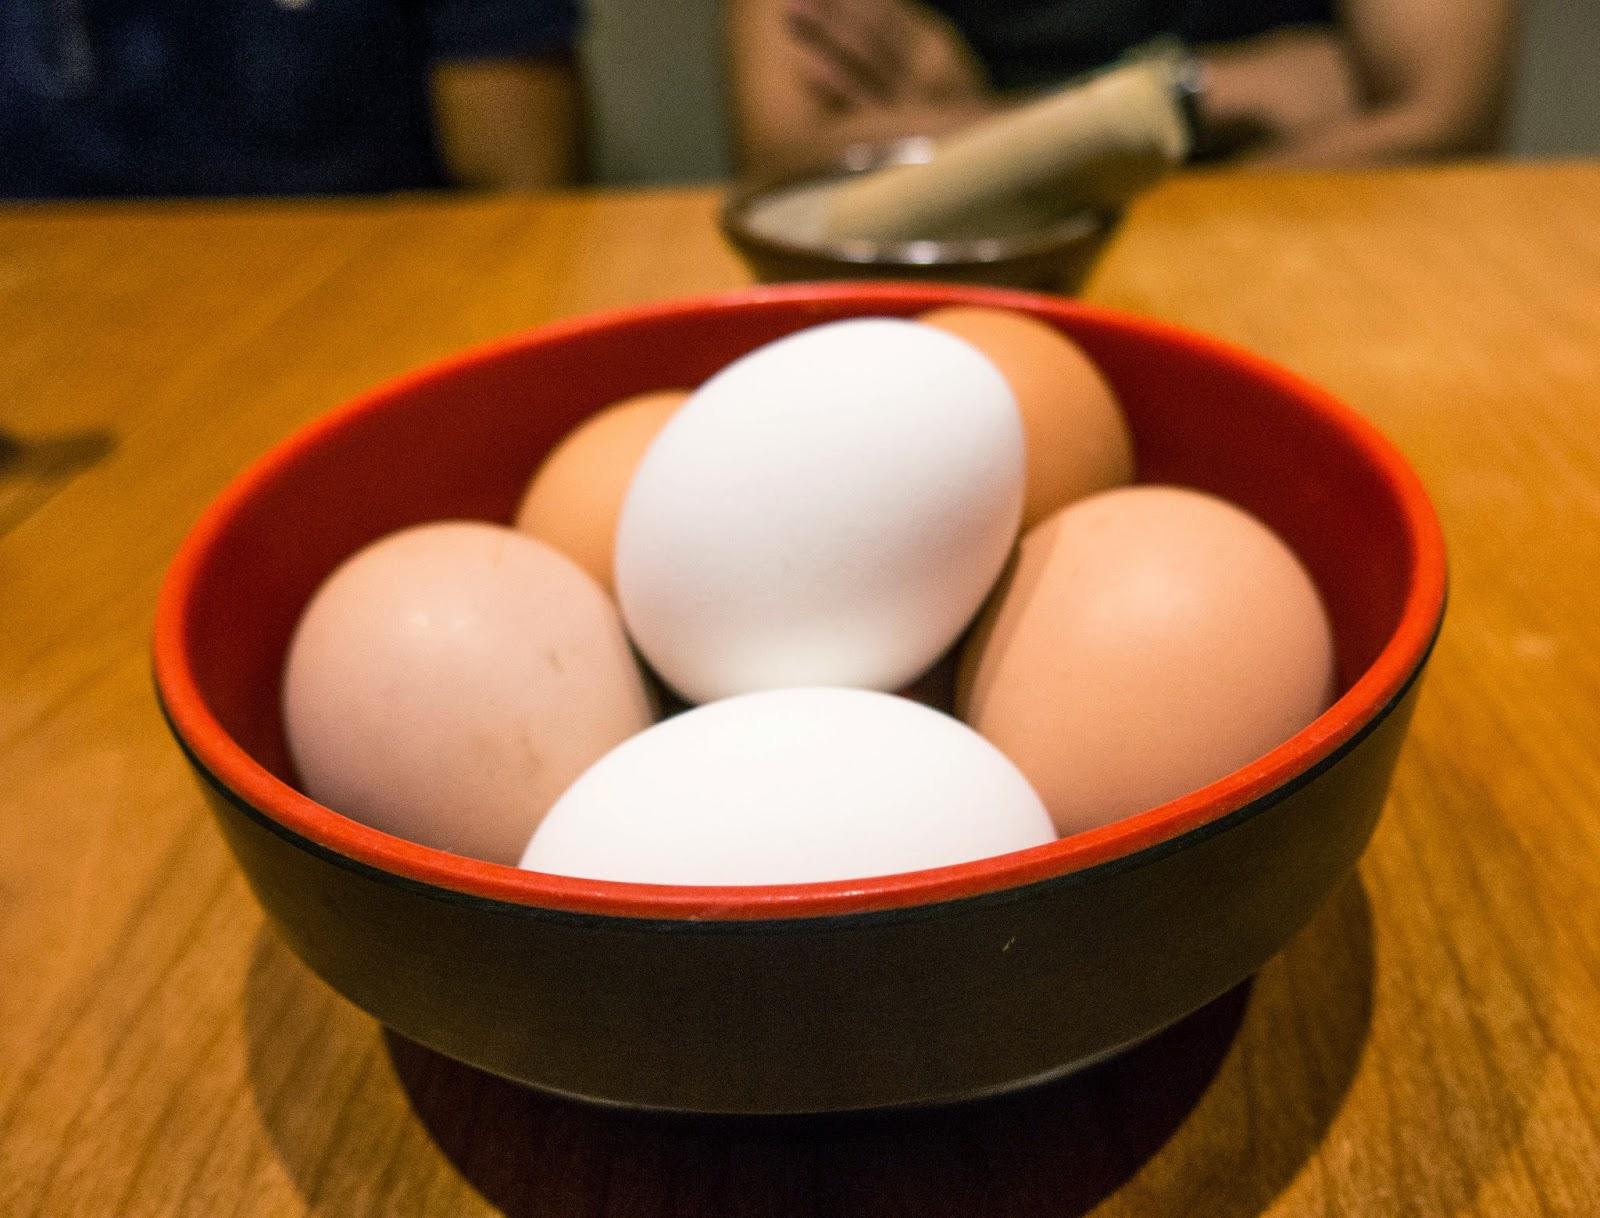 free eggs served by keisuke